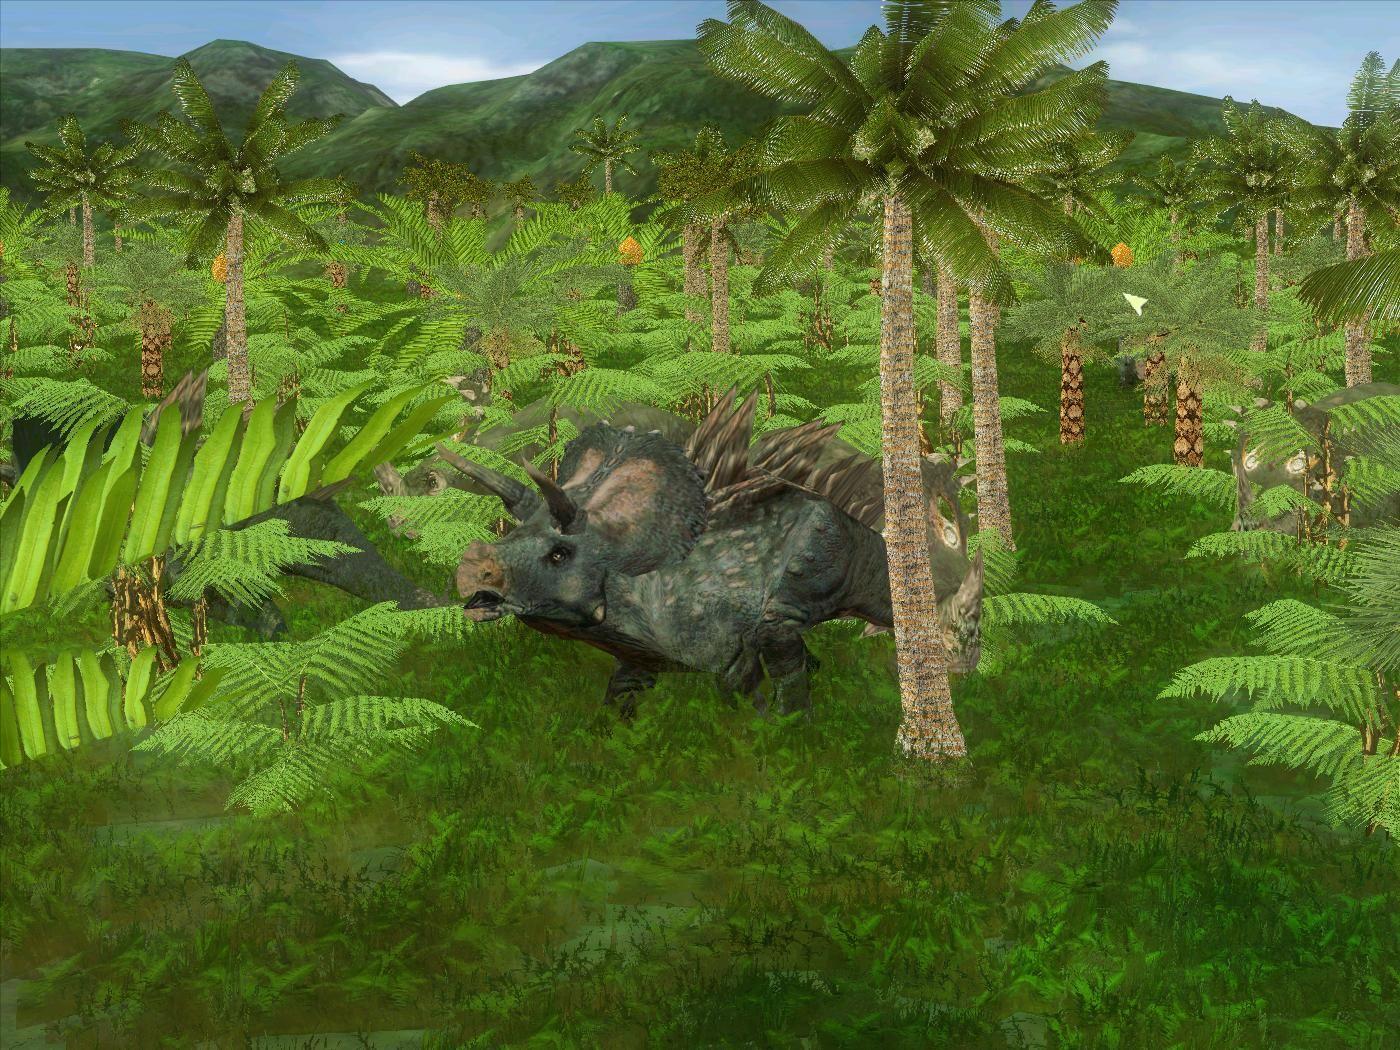 Stegoceratops. in 2020 Jurassic park, Jurassic world, Image